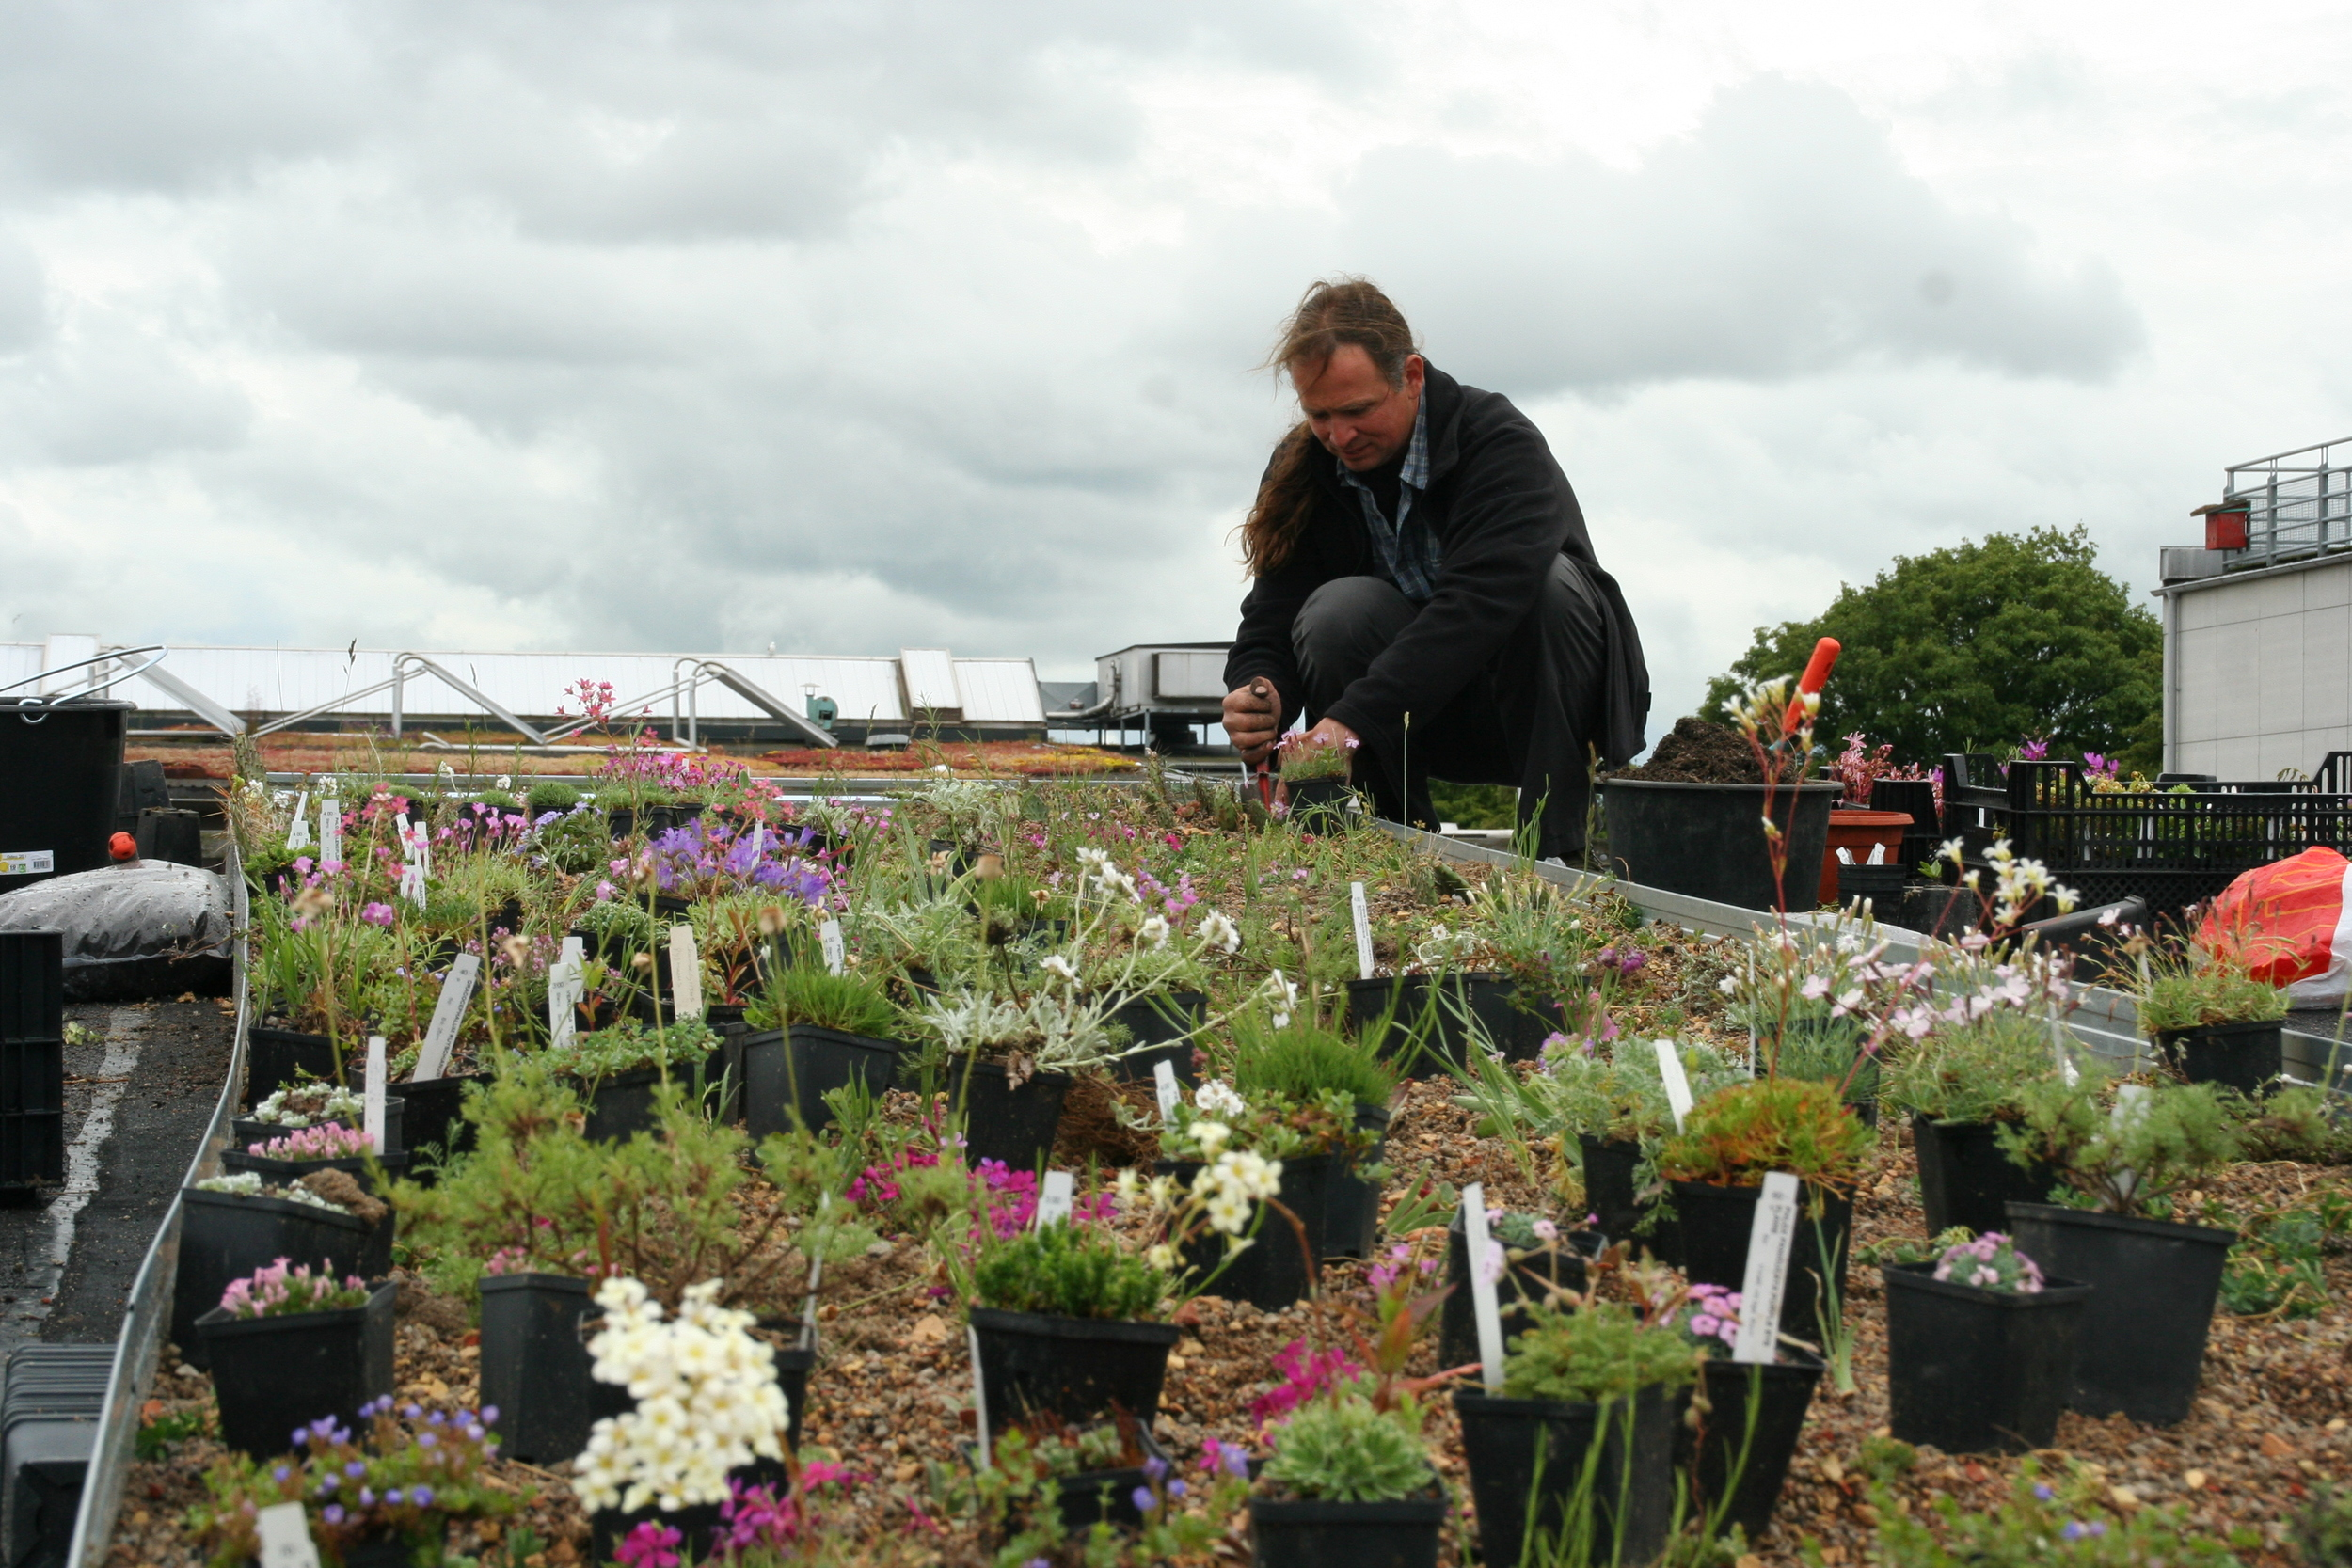 Peter Korn:Green Roof Installation. Augustenborg Botanical Roof Garden. June 2015